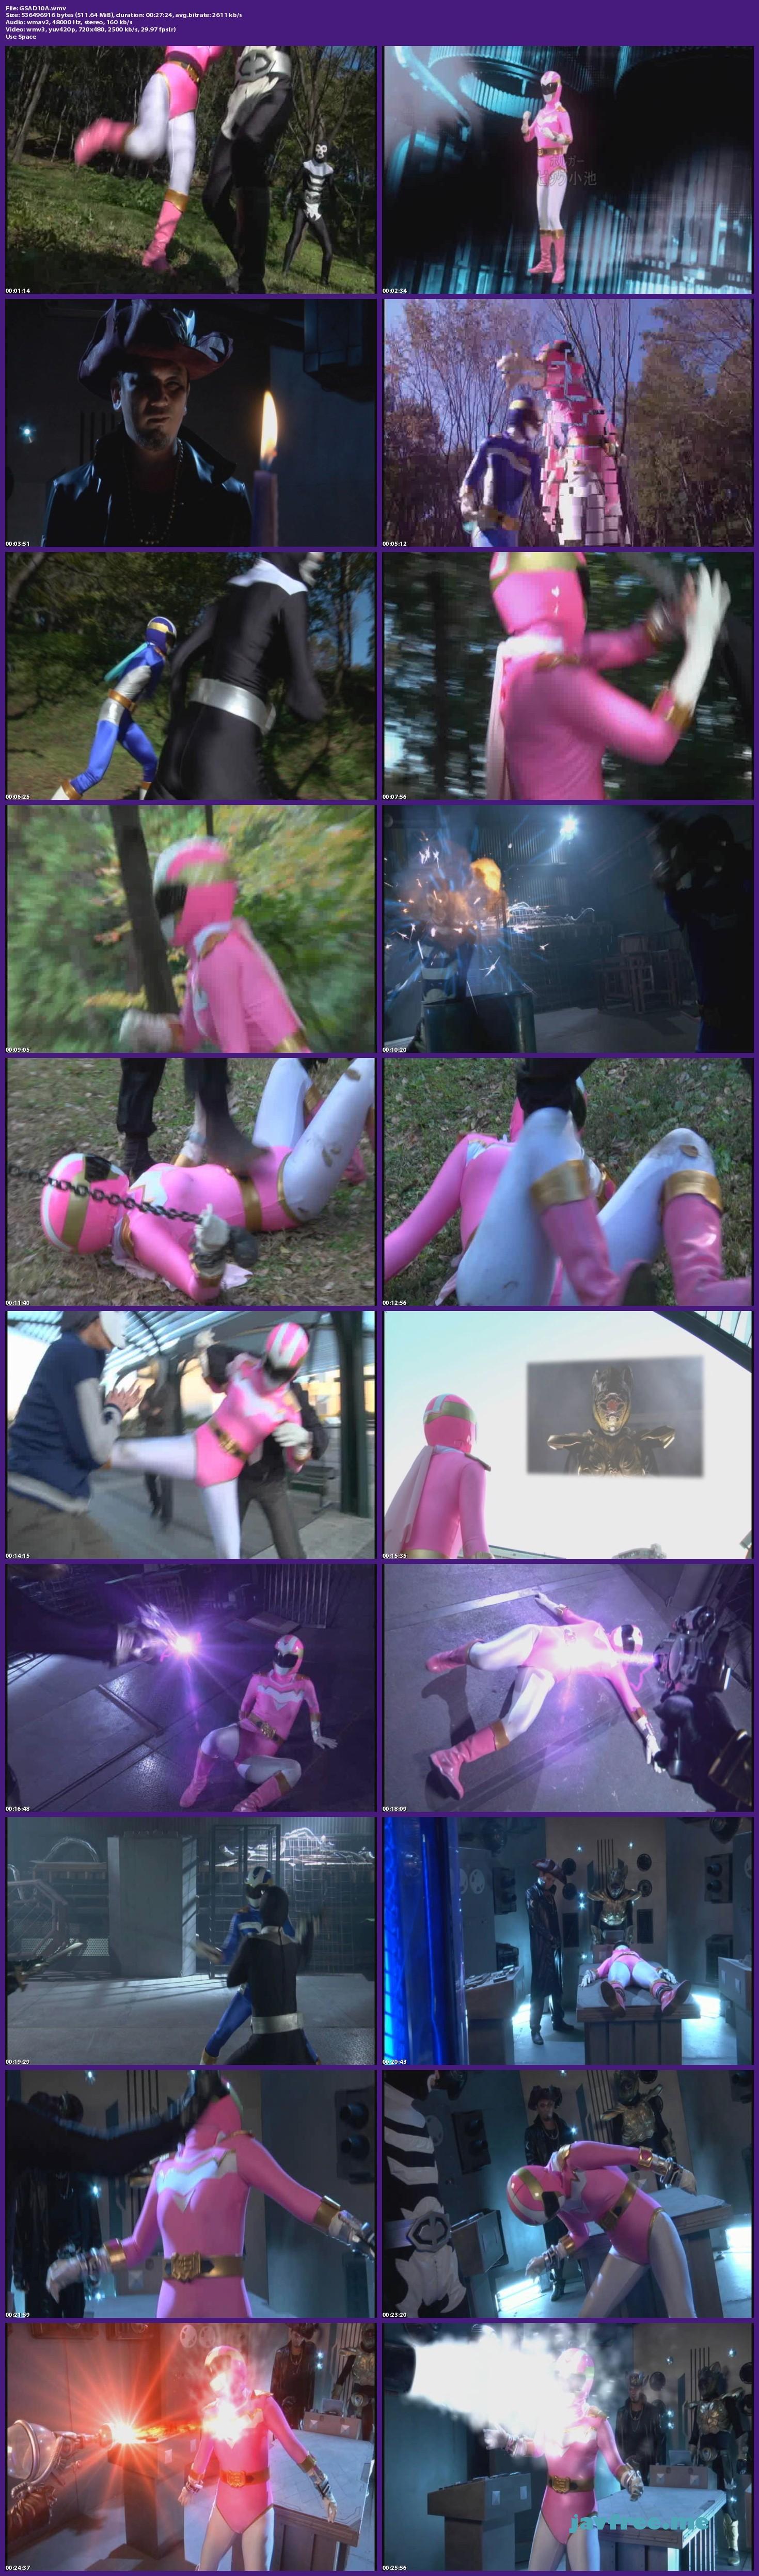 [GSAD 10] SUPER HEROINE アクションウォーズ 宇宙戦隊ギャラクシーファイブ ピンクフェニックス 美咲あすみ 美咲あすみ GIGA